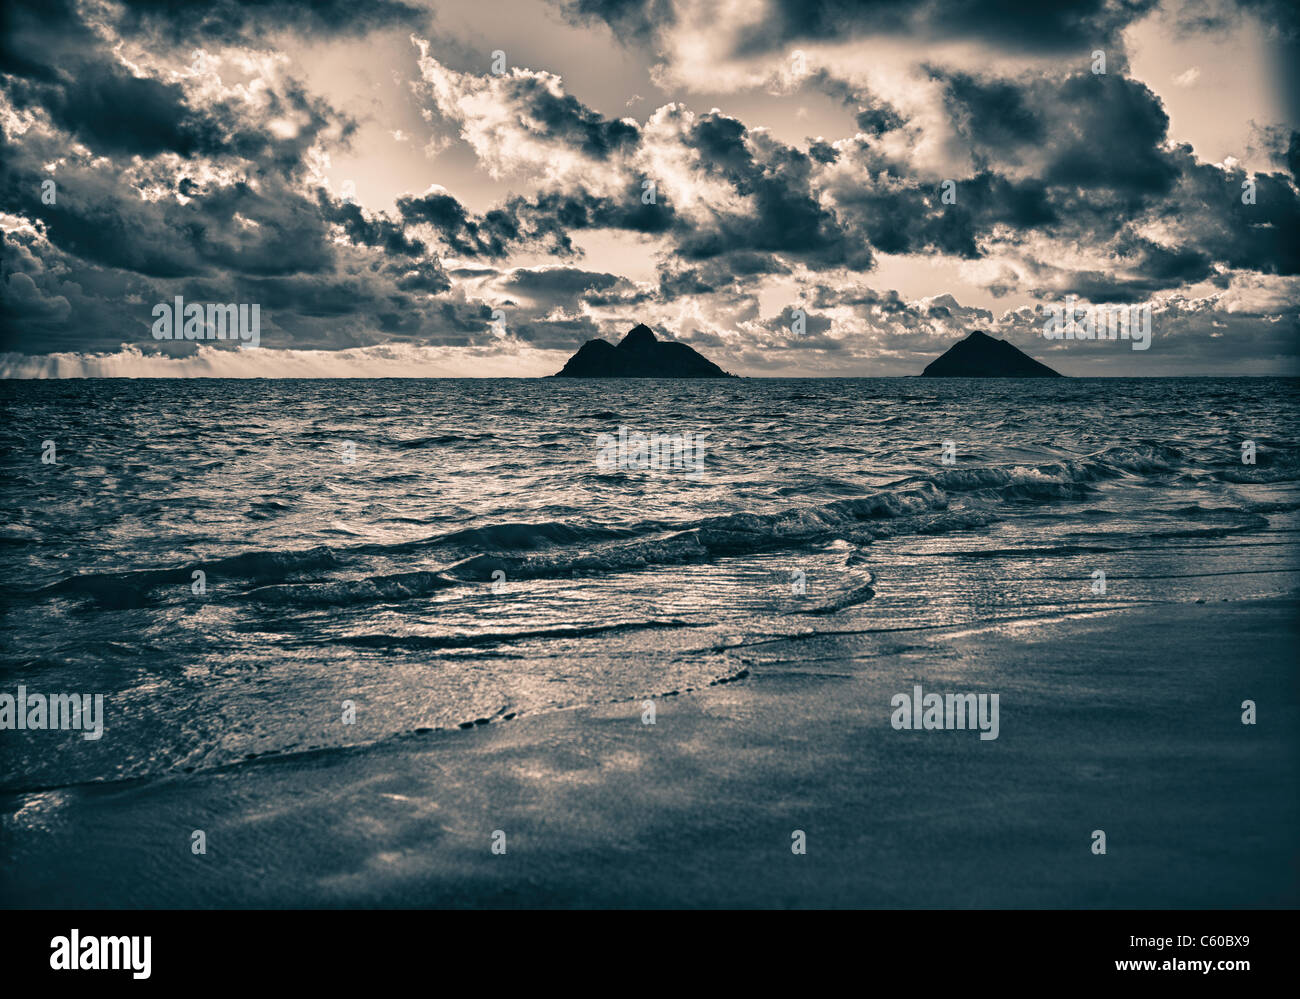 Sunrise landscape at Lanikai Beach, B&W image, dramatic clouds, Mokulua Islands in distance - Stock Image